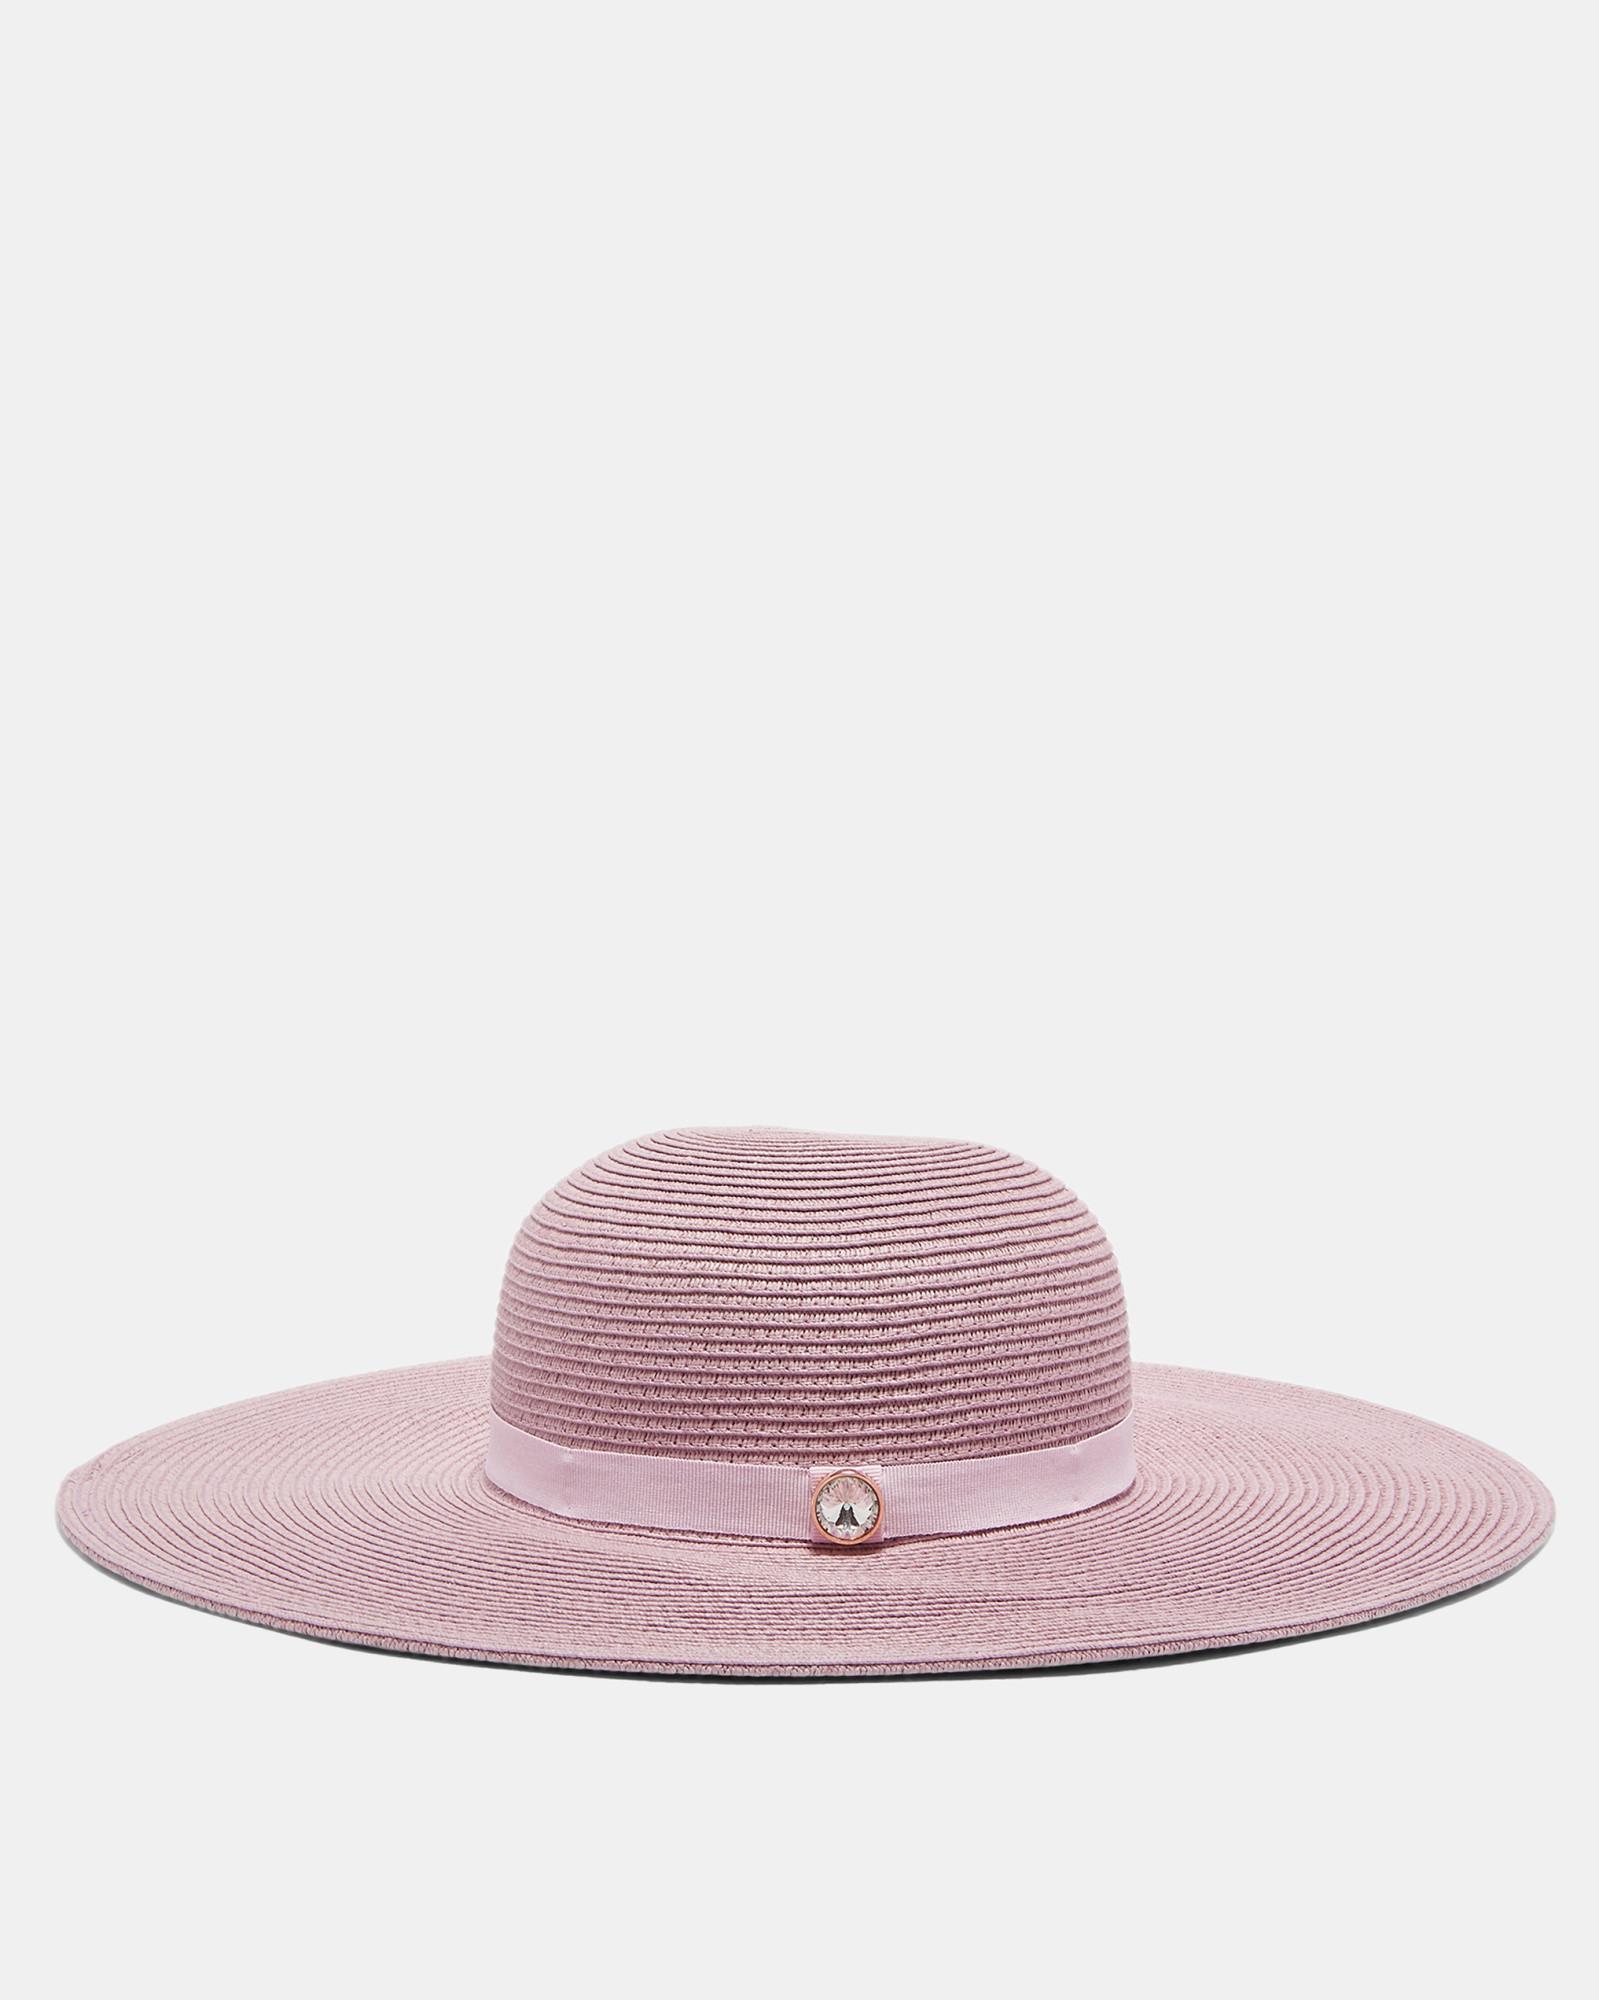 5f471f3afea2e Lyst - Ted Baker Gem Detail Floppy Hat in Pink